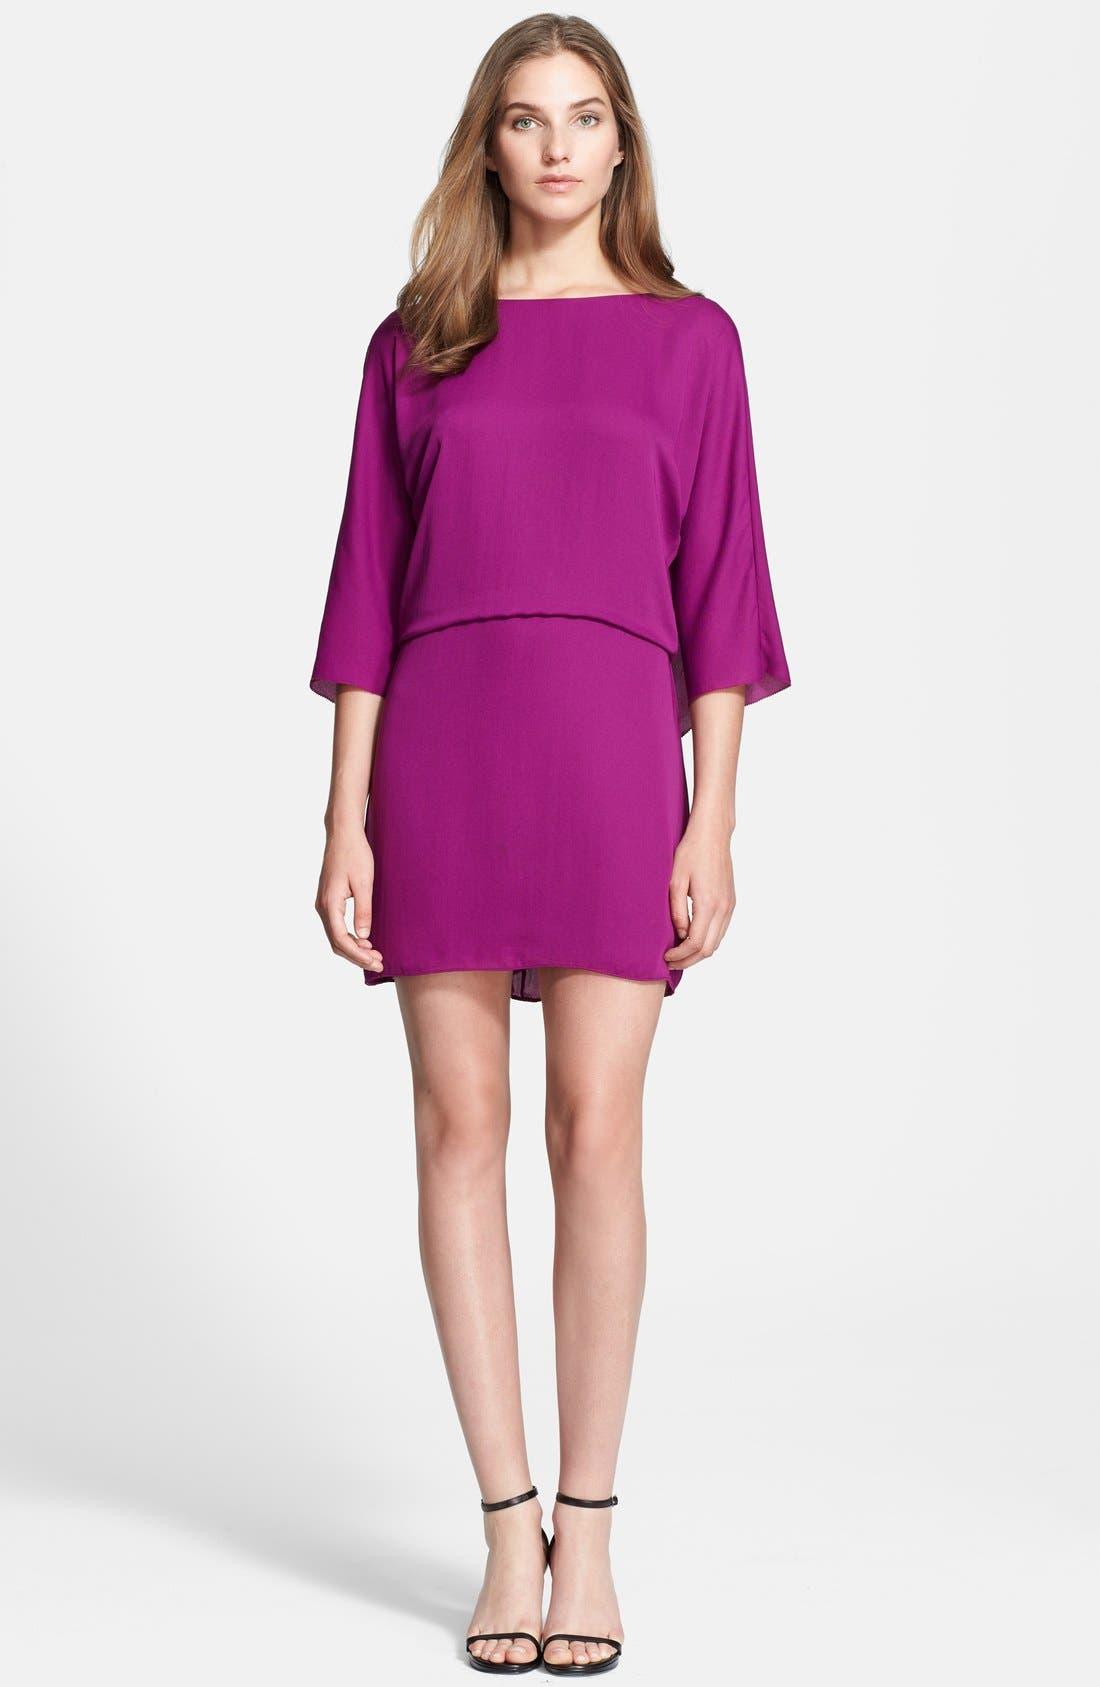 Alternate Image 1 Selected - Halston Heritage Georgette Blouson Dress